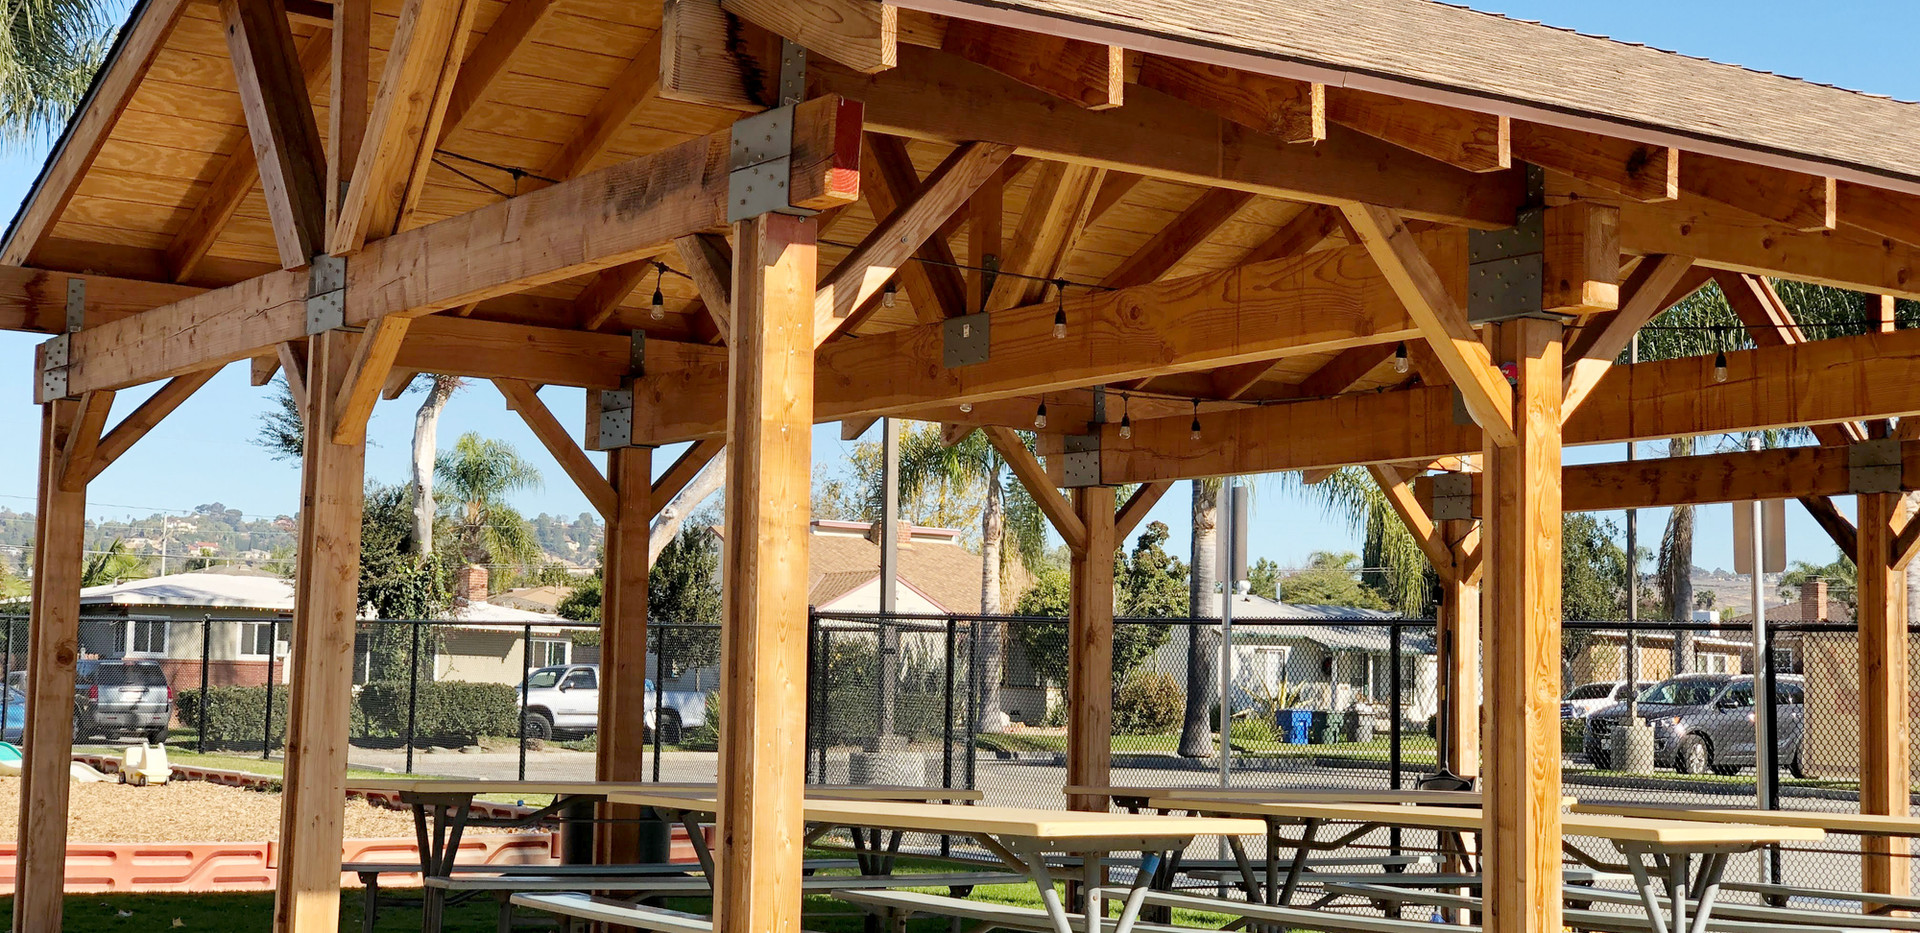 facilities_0003_IMG_1530.jpg